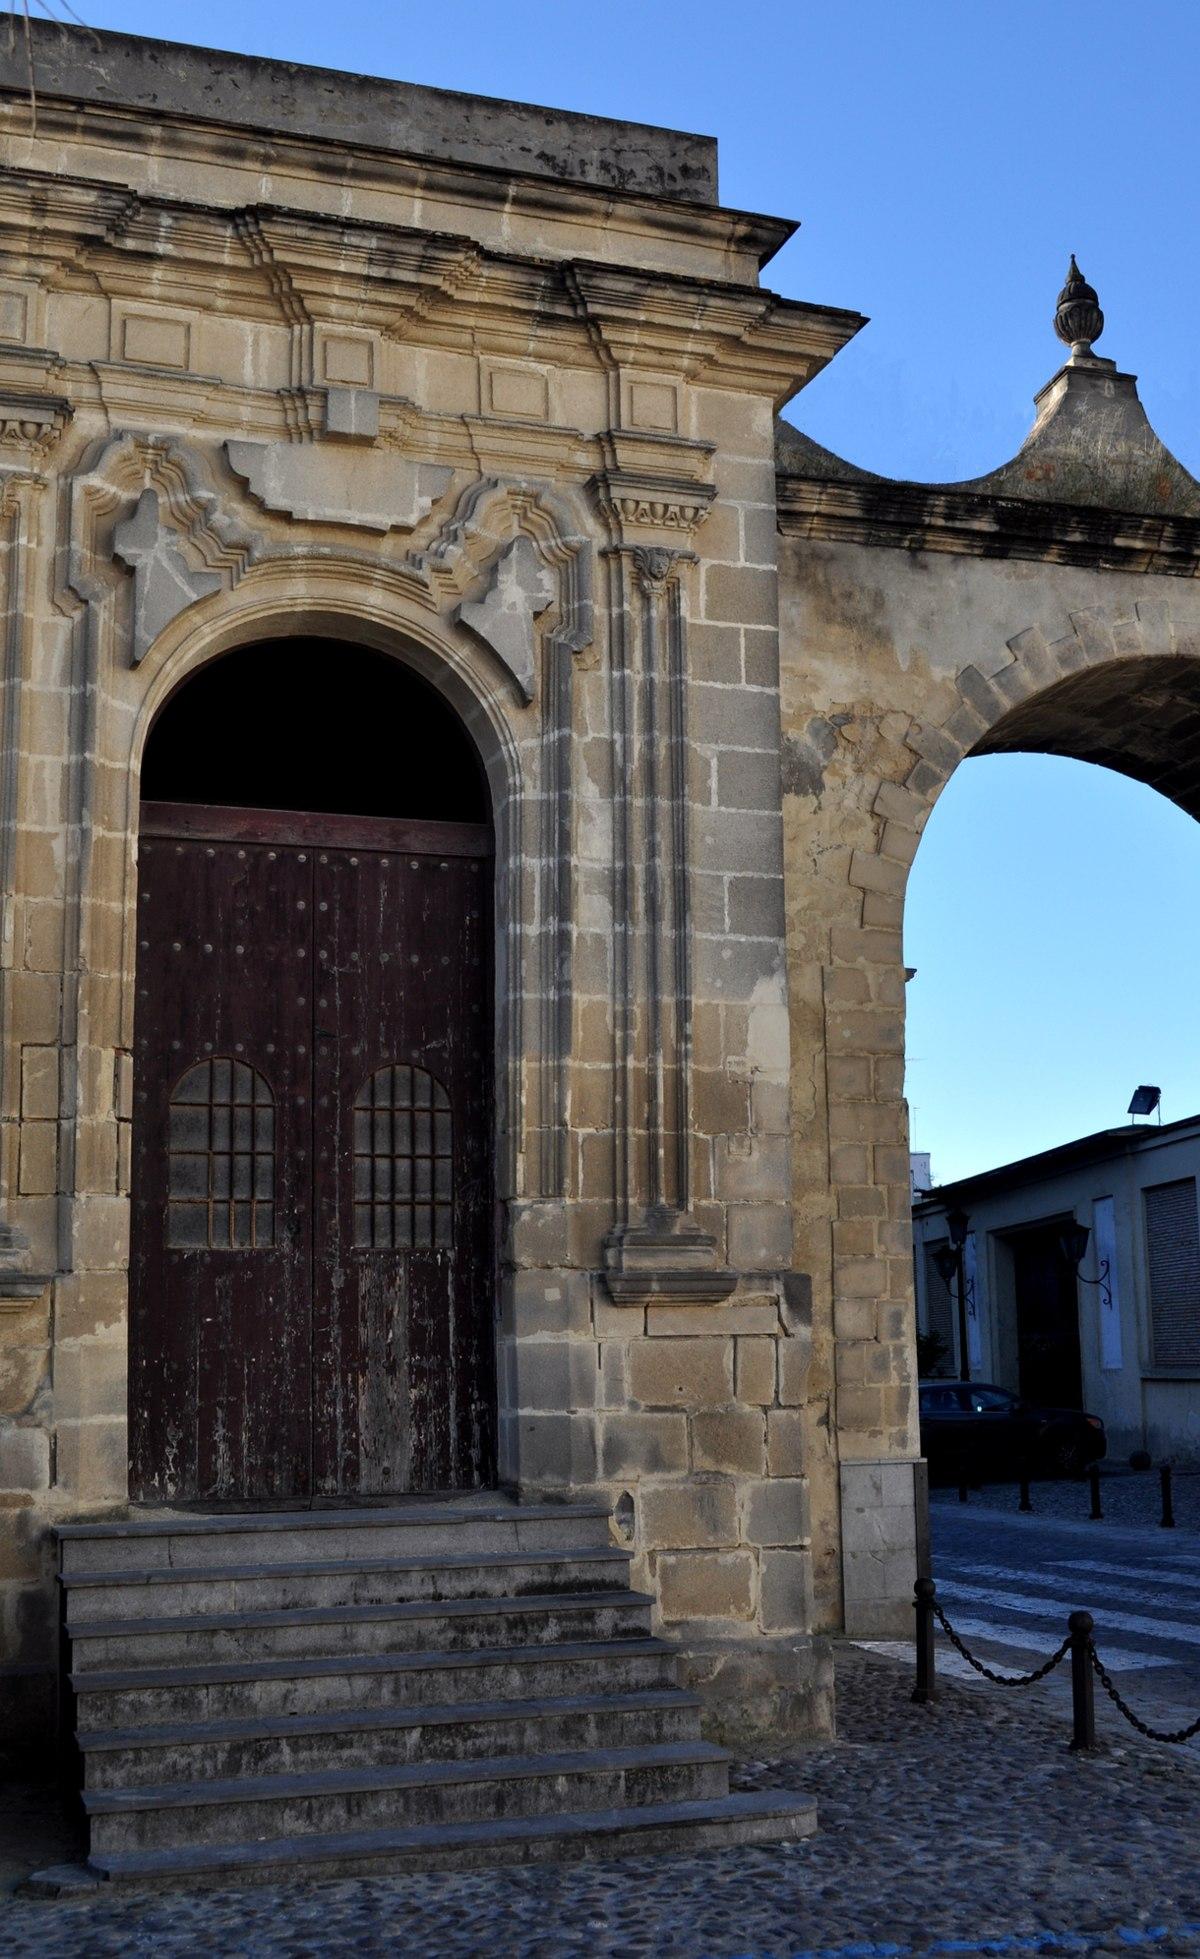 Capilla de la Antigua (Jerez de la Frontera) - Wikipedia